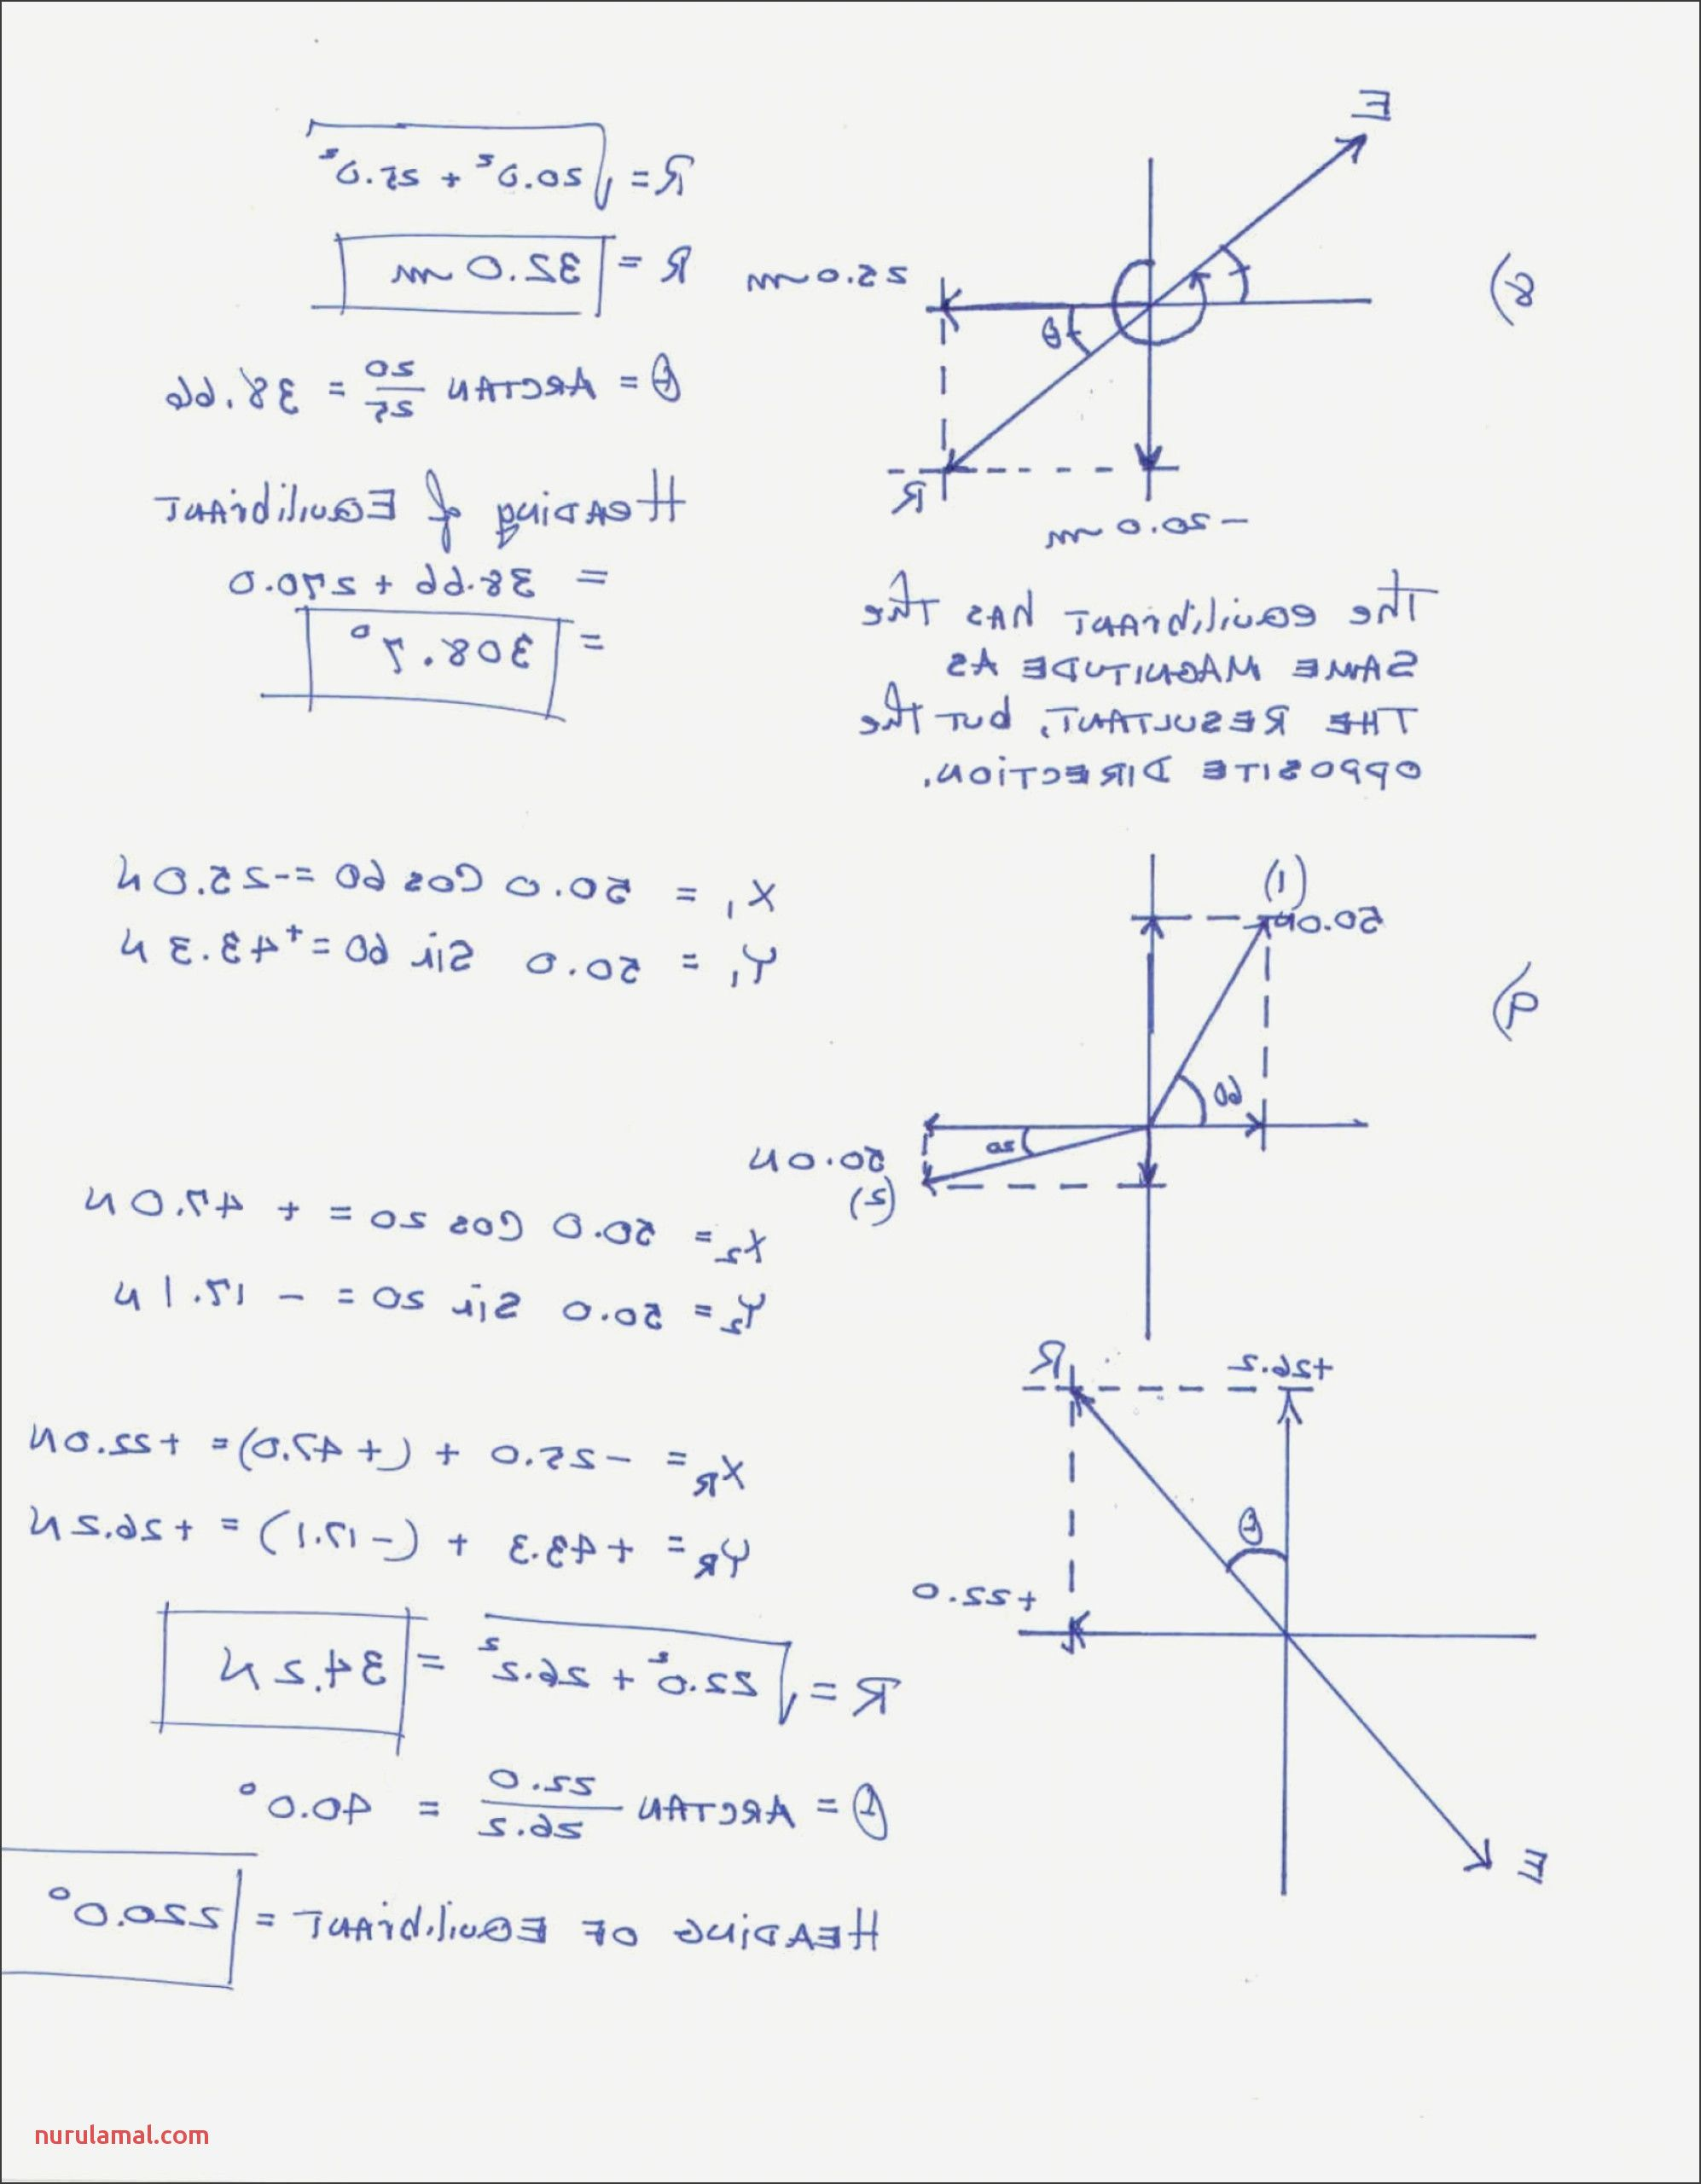 7th Grade Math Worksheets Printable In 2020 Math Worksheets Kindergarten Math Worksheets Geometry Worksheets